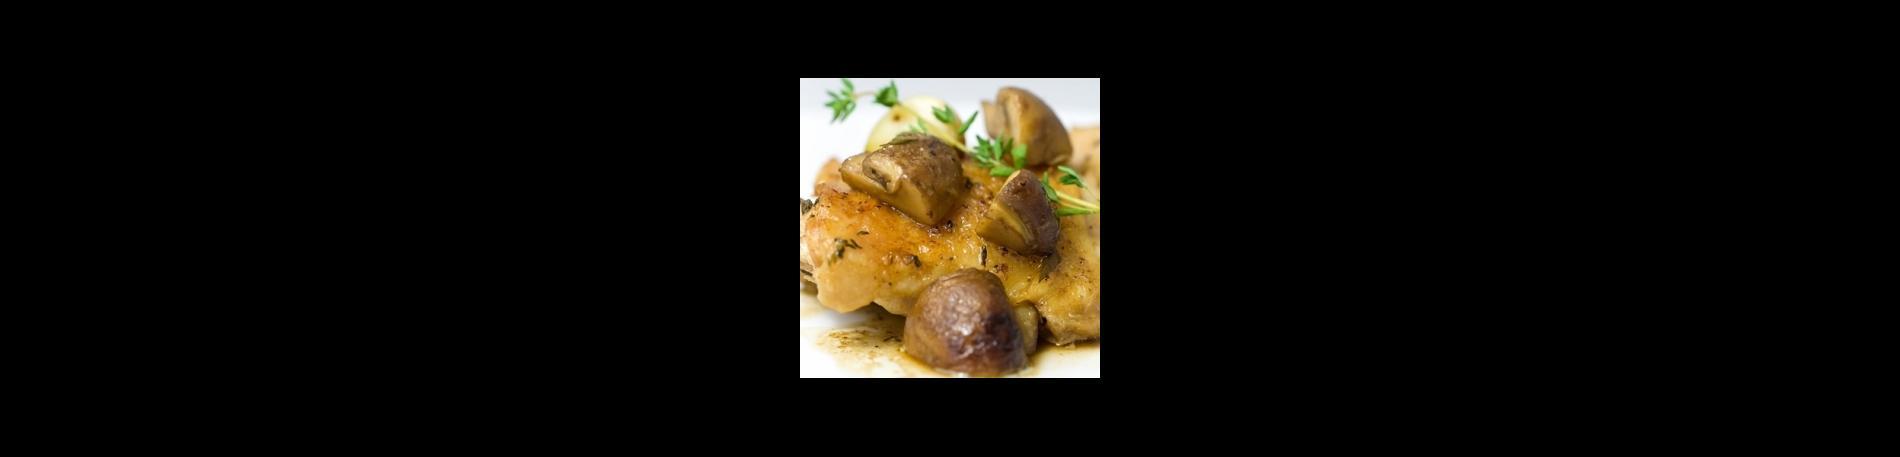 Pollo ahumado con champignons